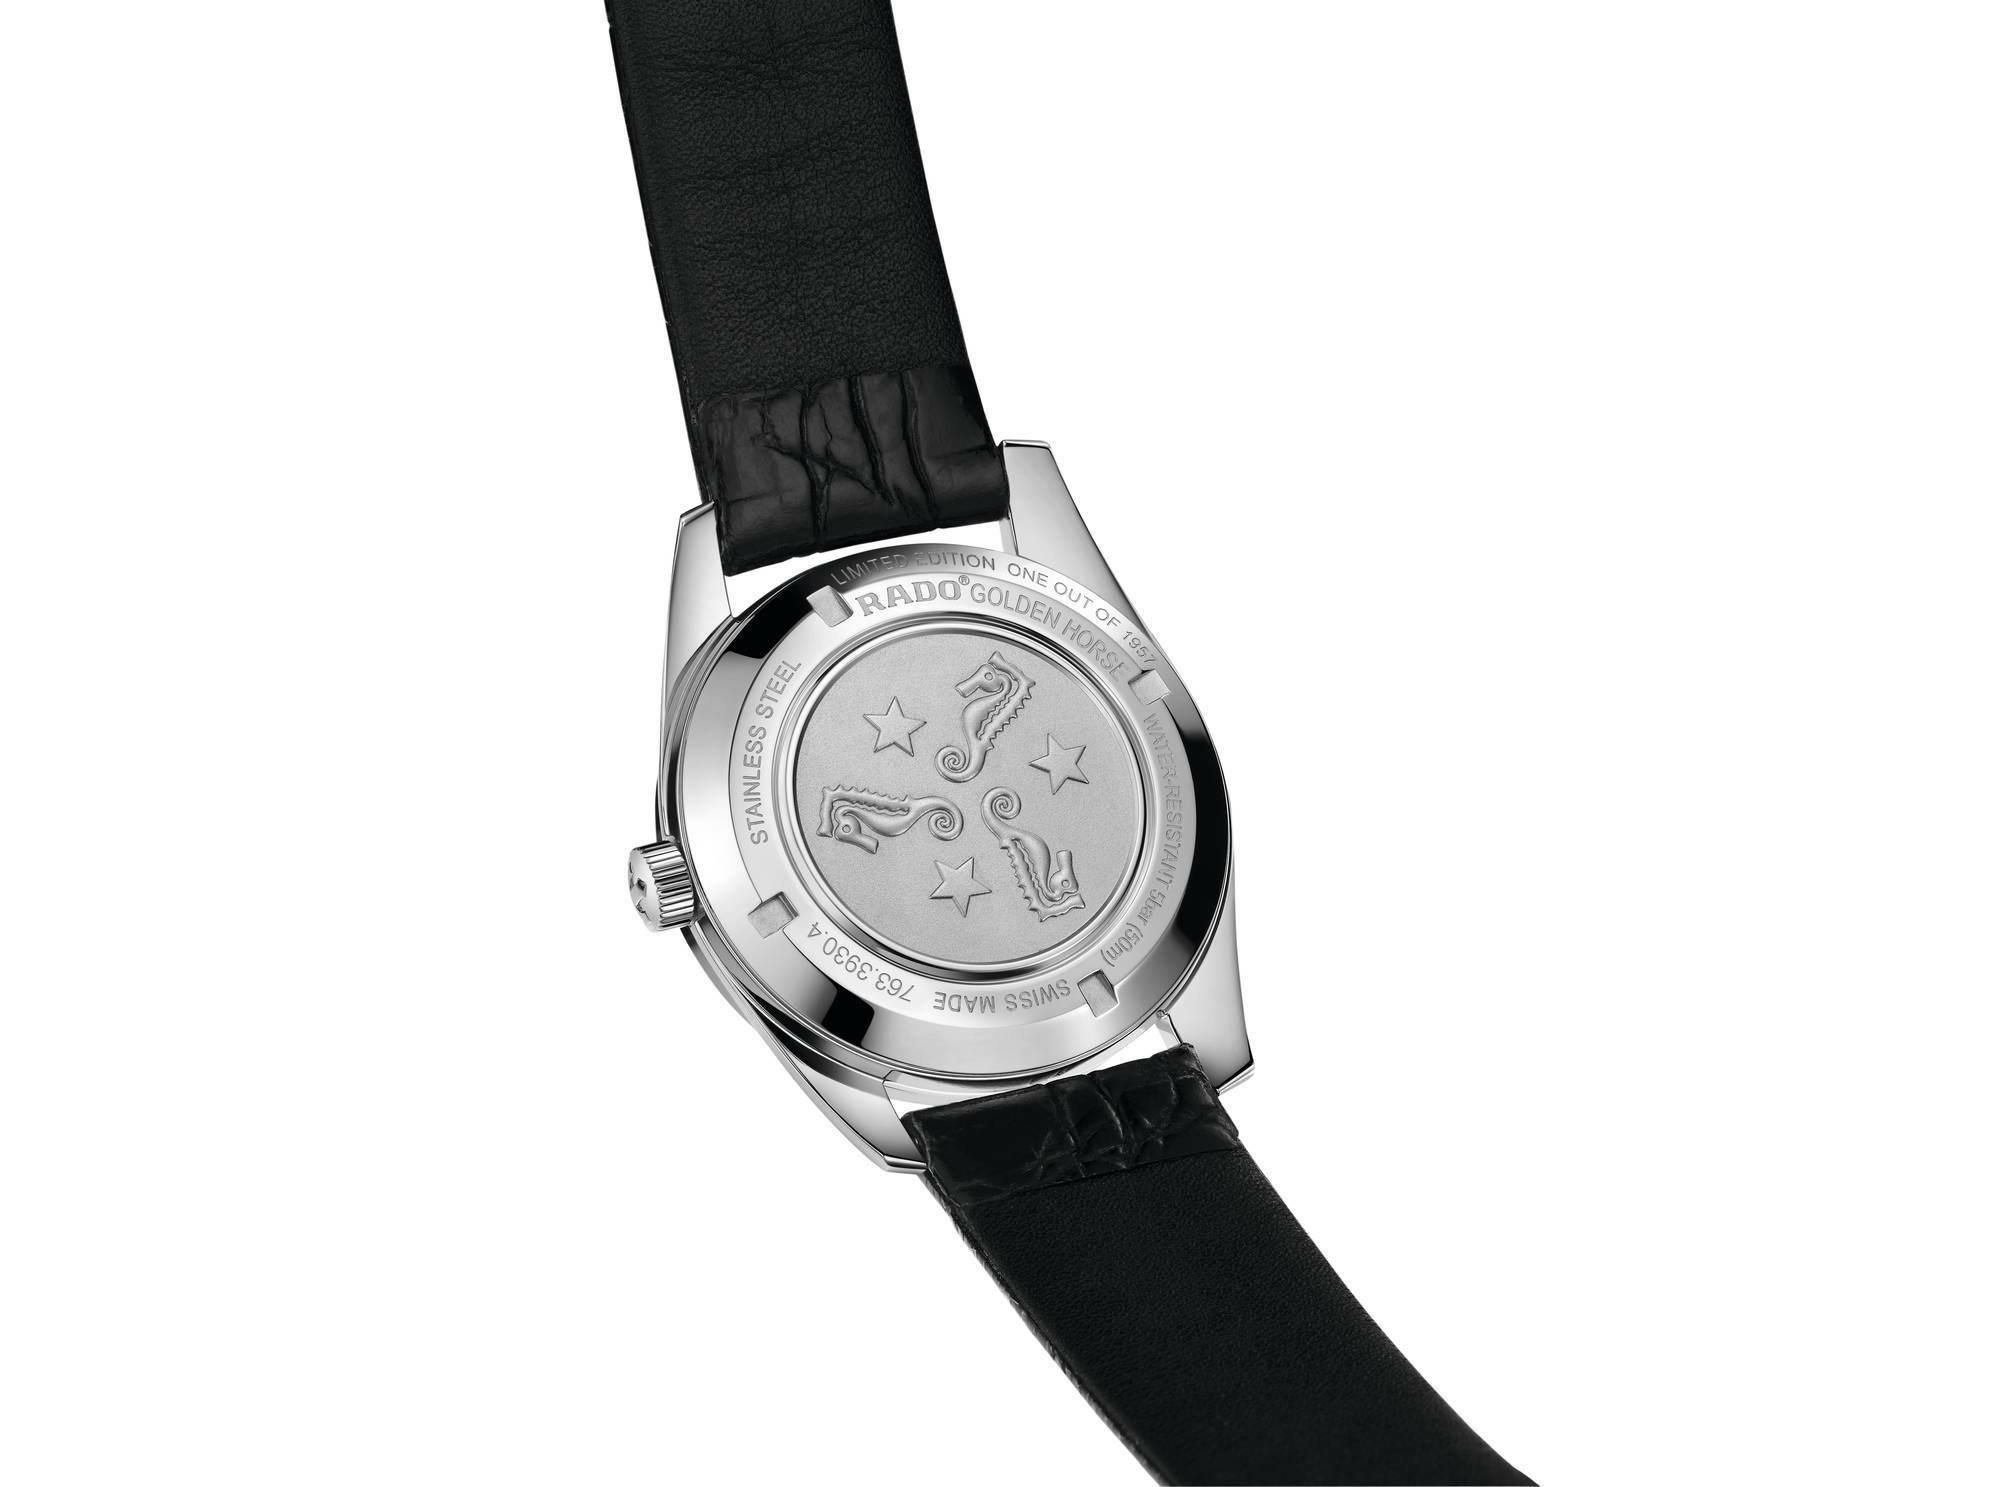 【RADO ラドー】復刻限定品/Golden Horse1957 Limited Edition ゴールデンホース1957本限定/国内正規品 腕時計